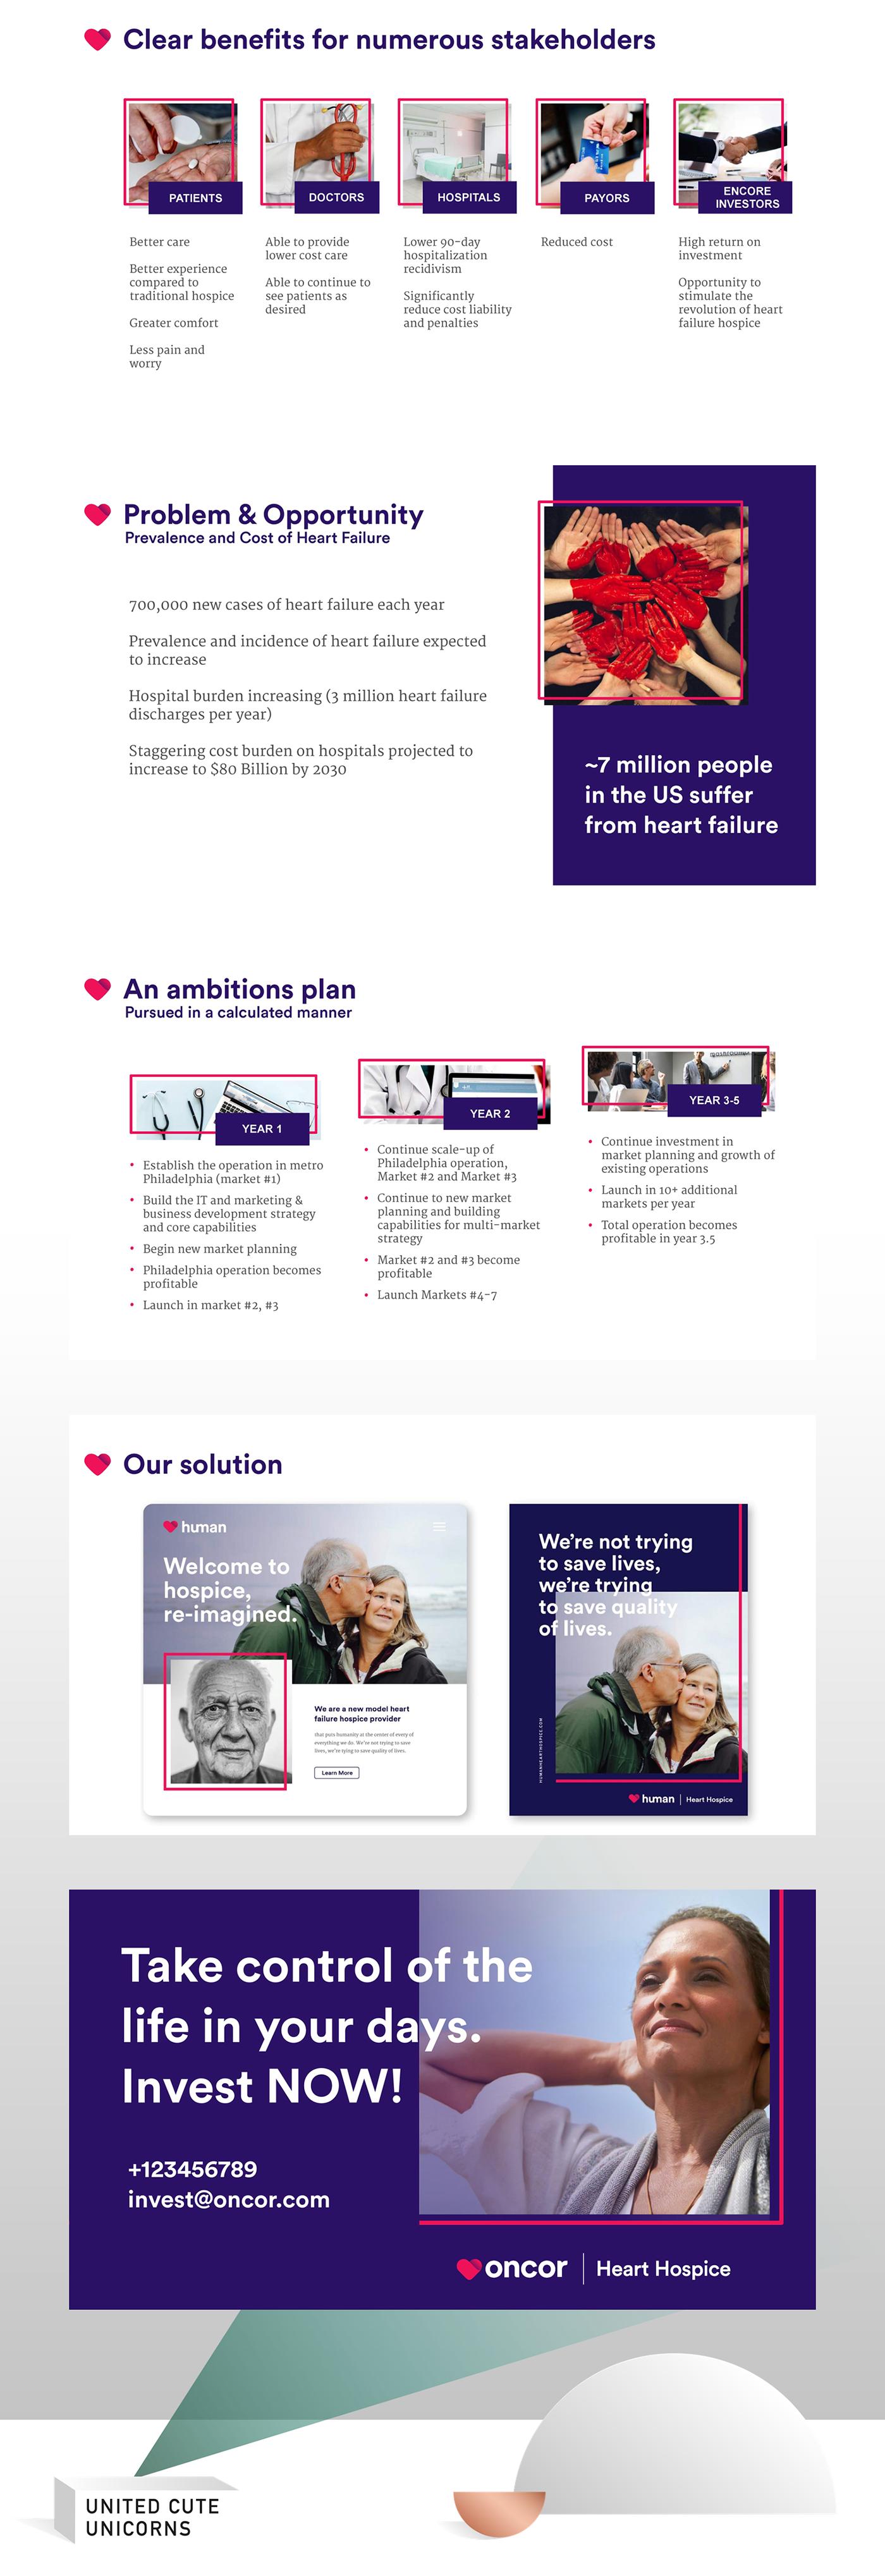 PPT key Powerpoint Keynote presentation investment presentation pitch deck